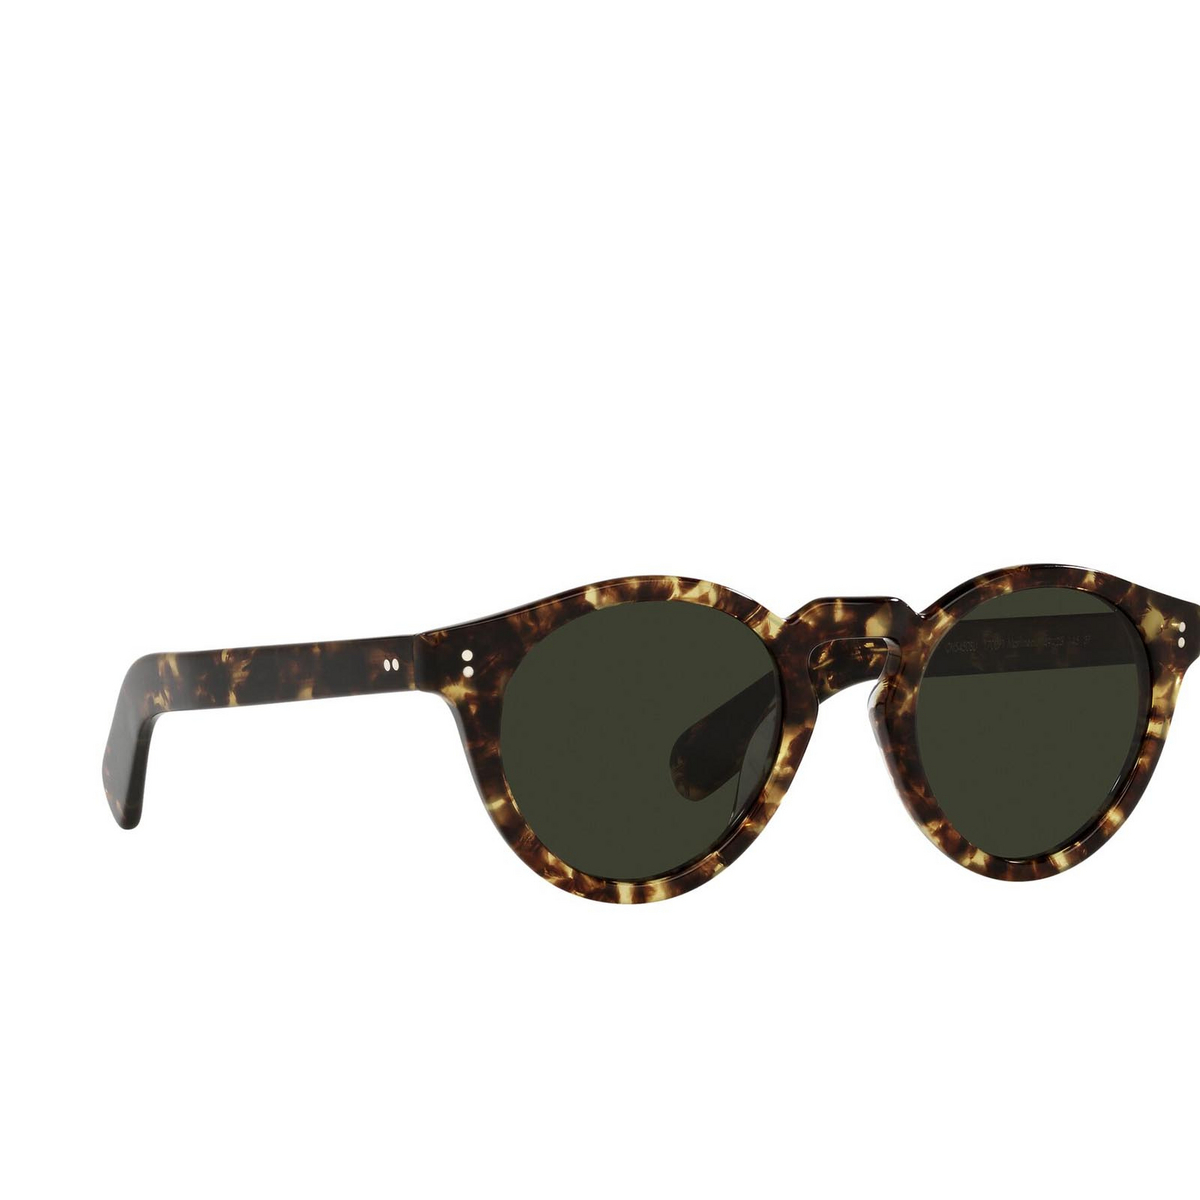 Oliver Peoples® Round Sunglasses: Martineaux OV5450SU color 382 1700P1 - three-quarters view.